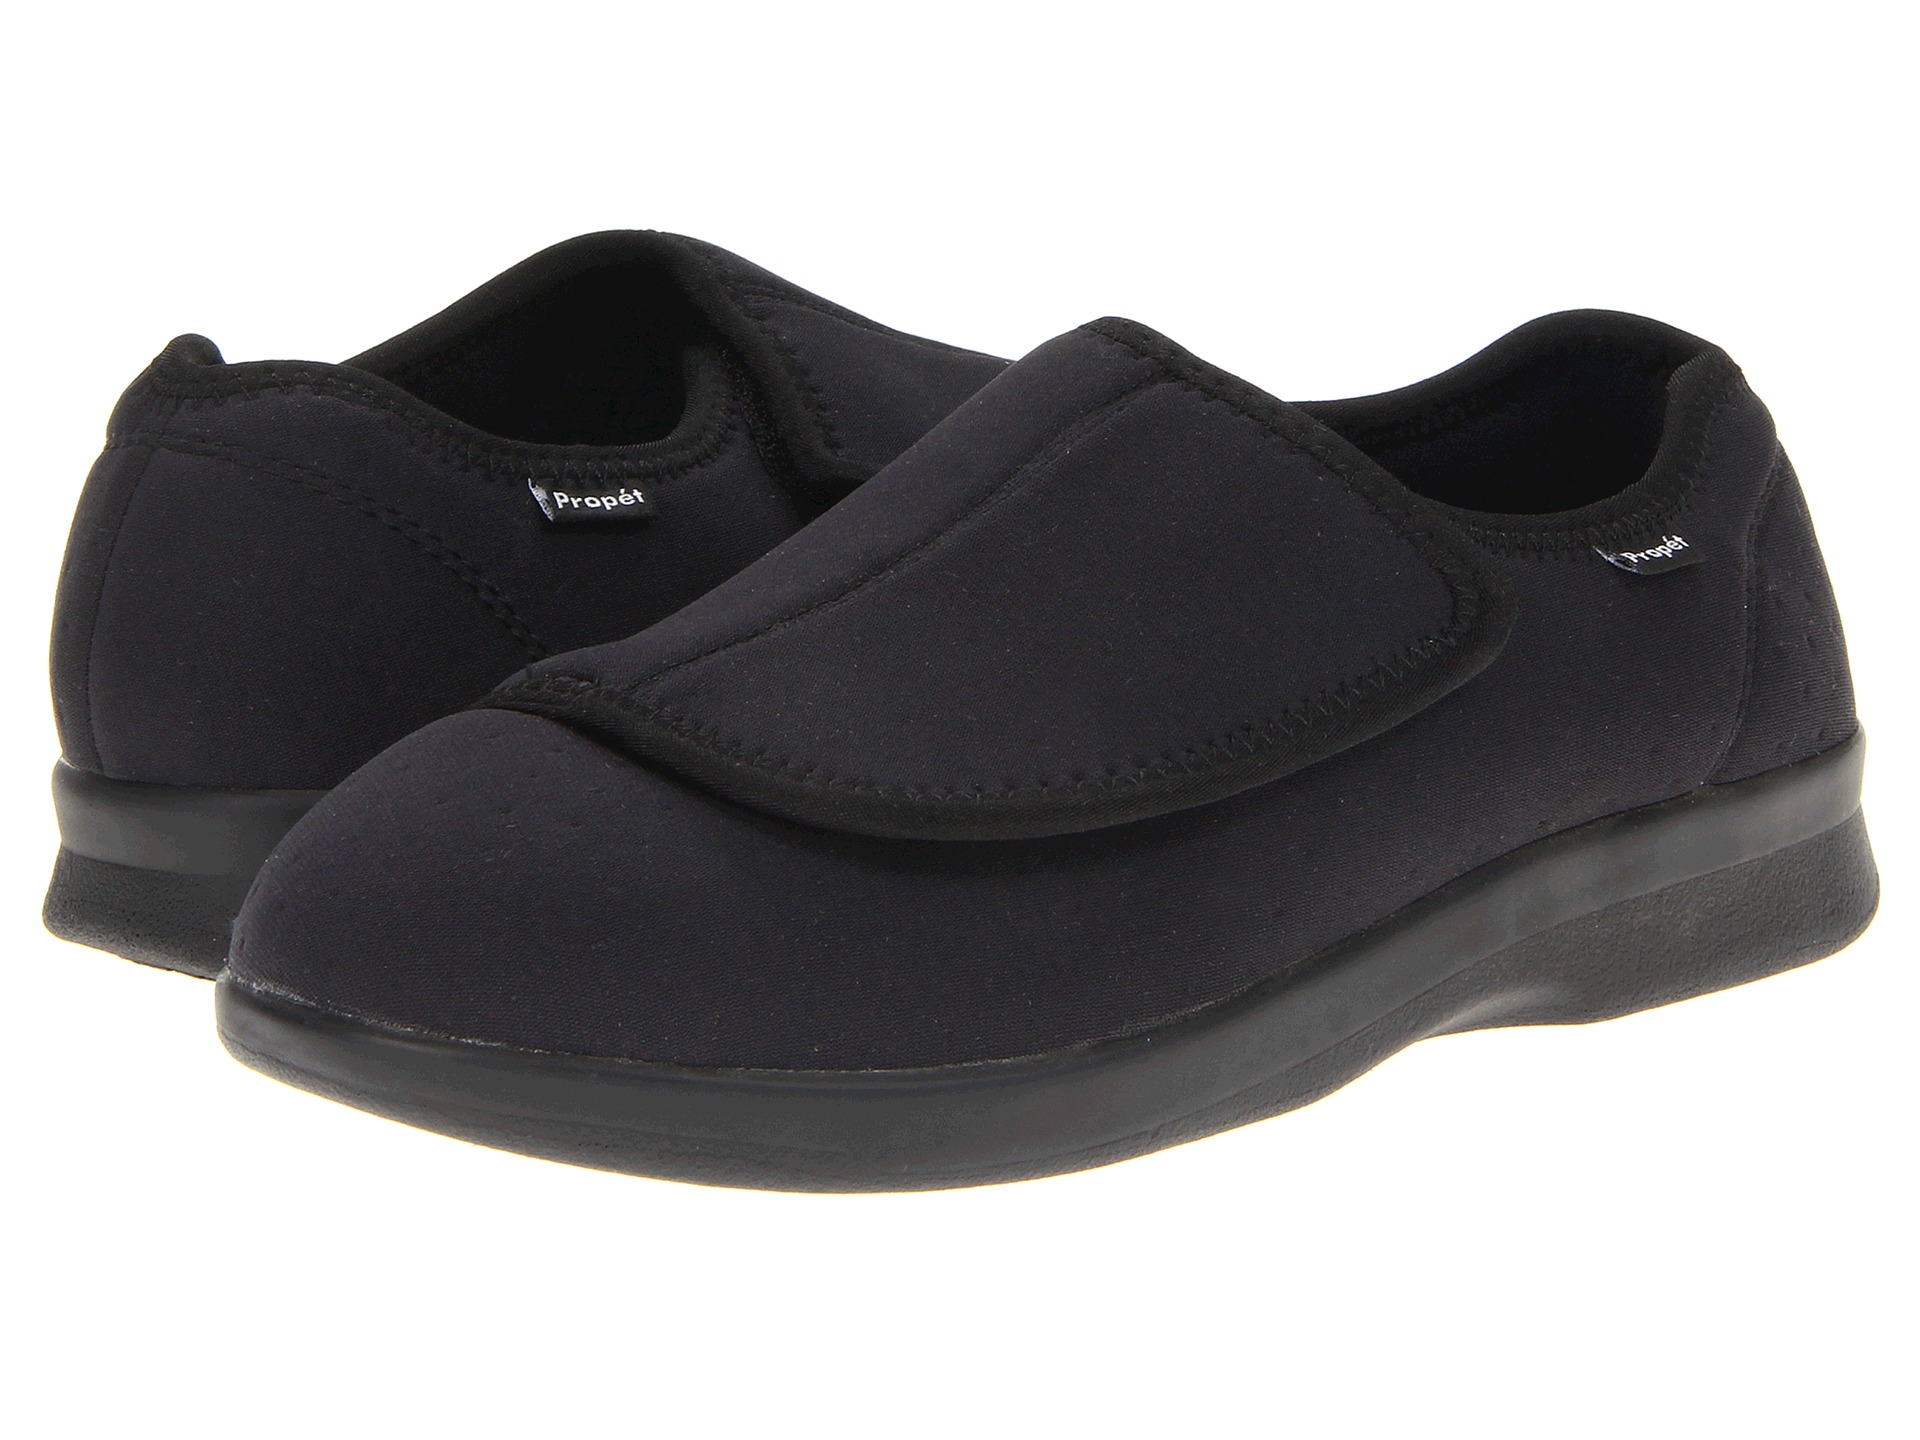 Diabetic Shoes For Women Medicare